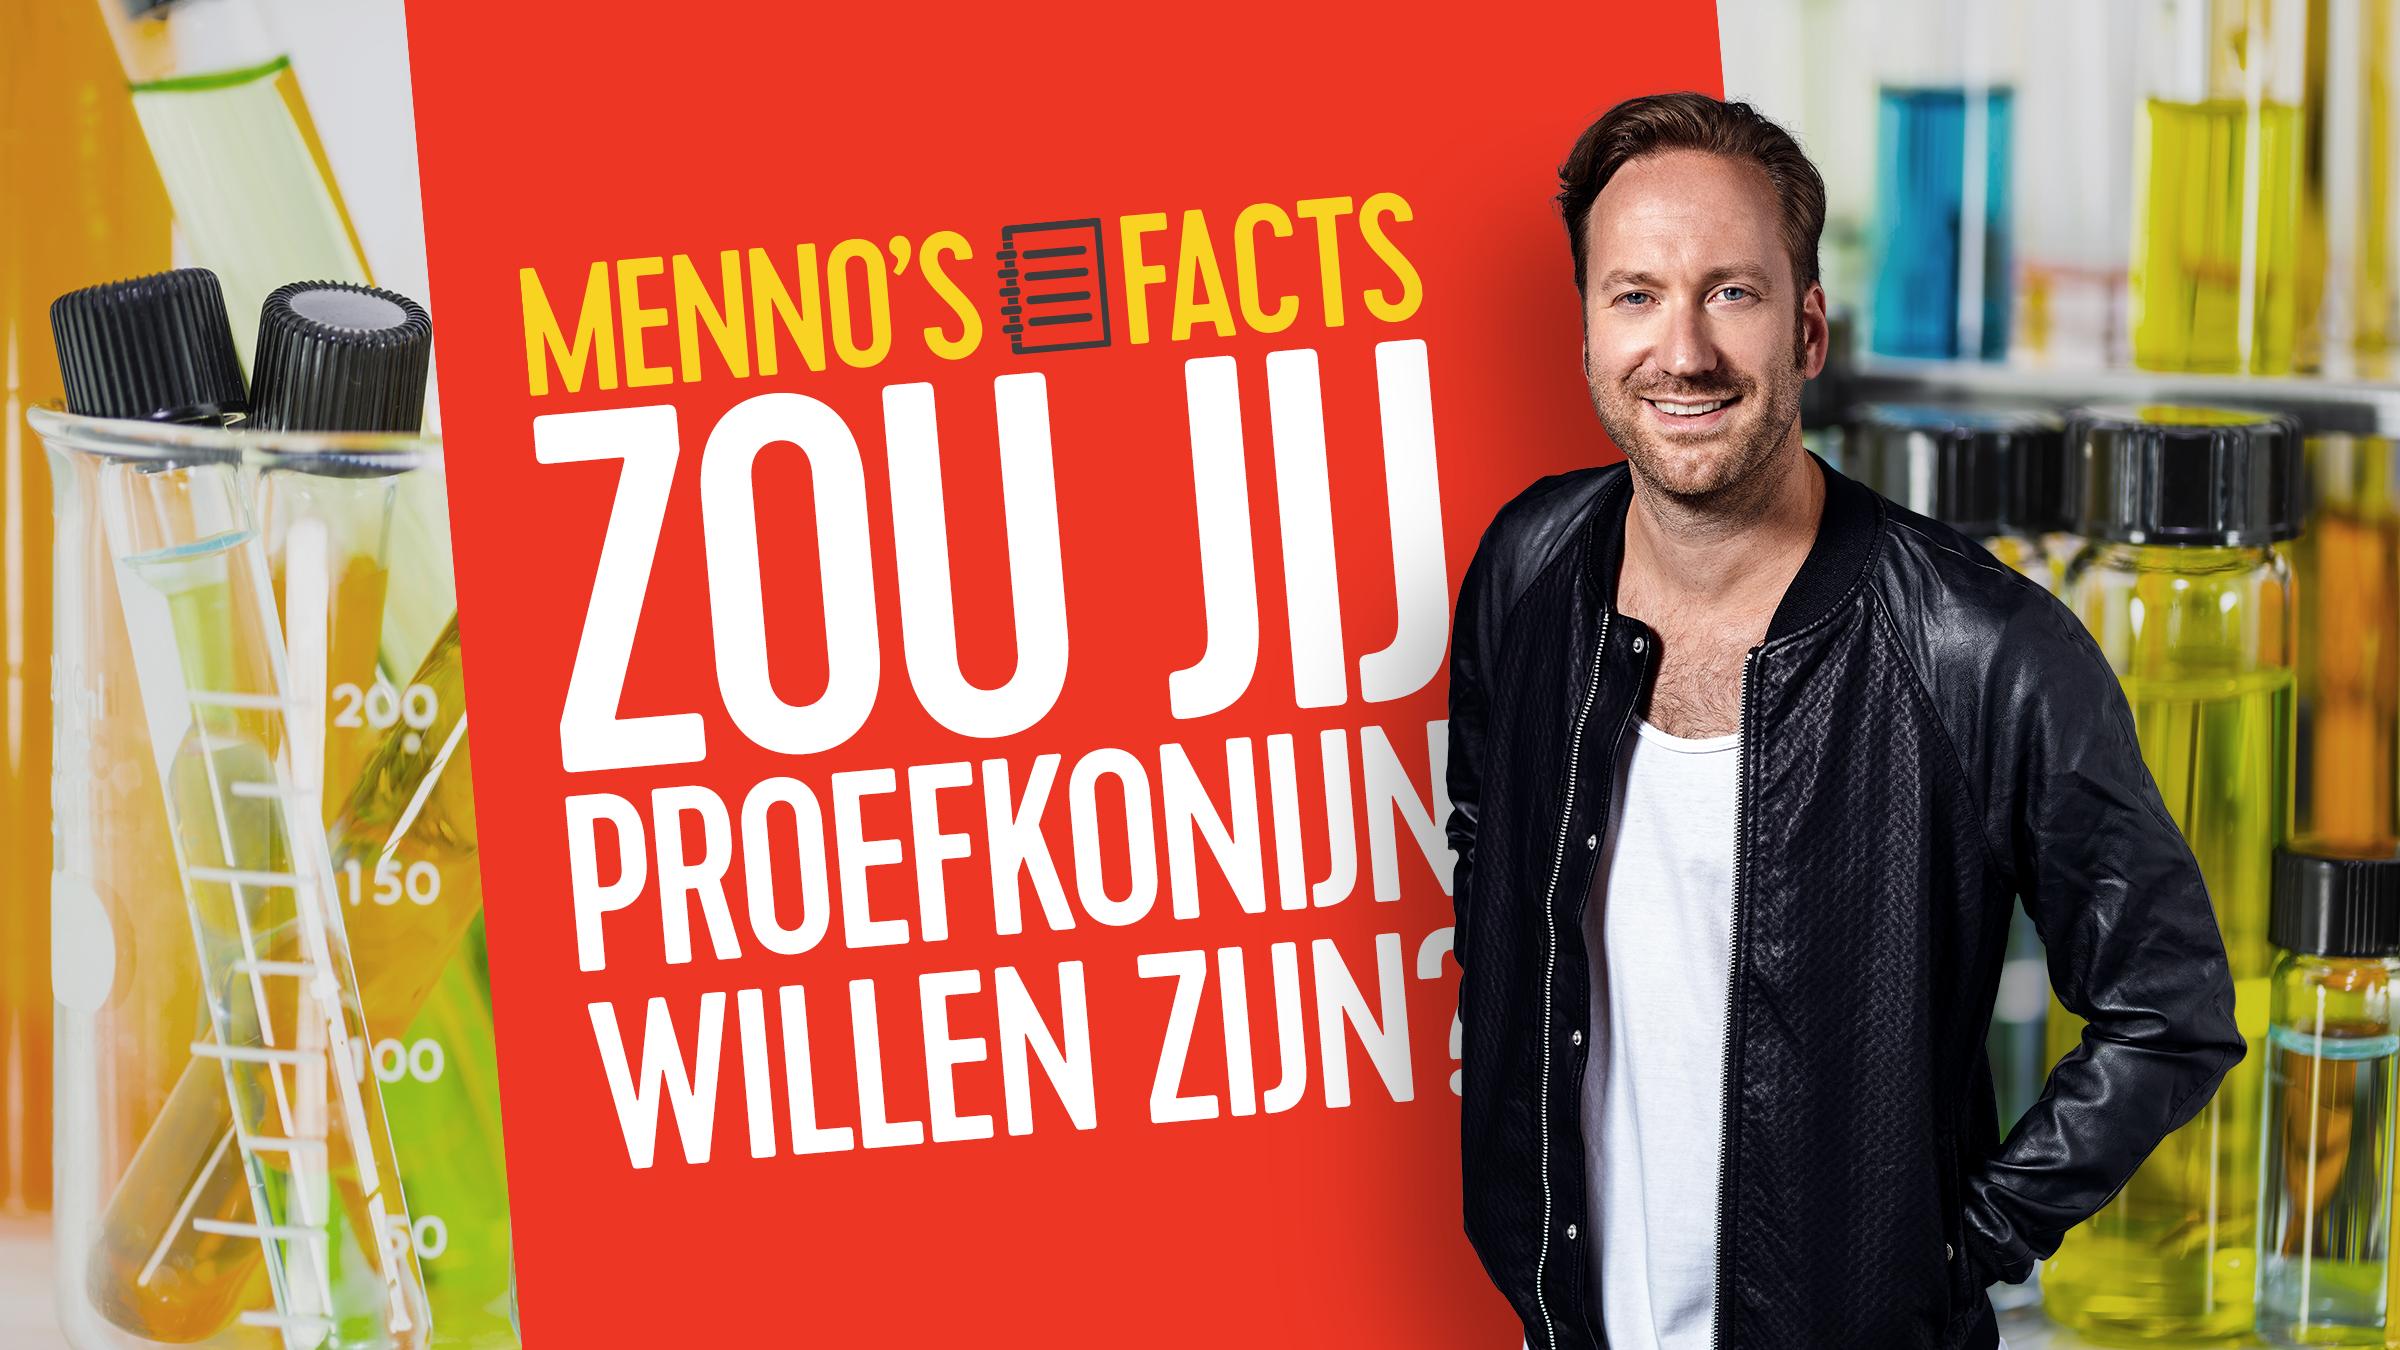 Proefkonijn teaser basis mennosfacts17